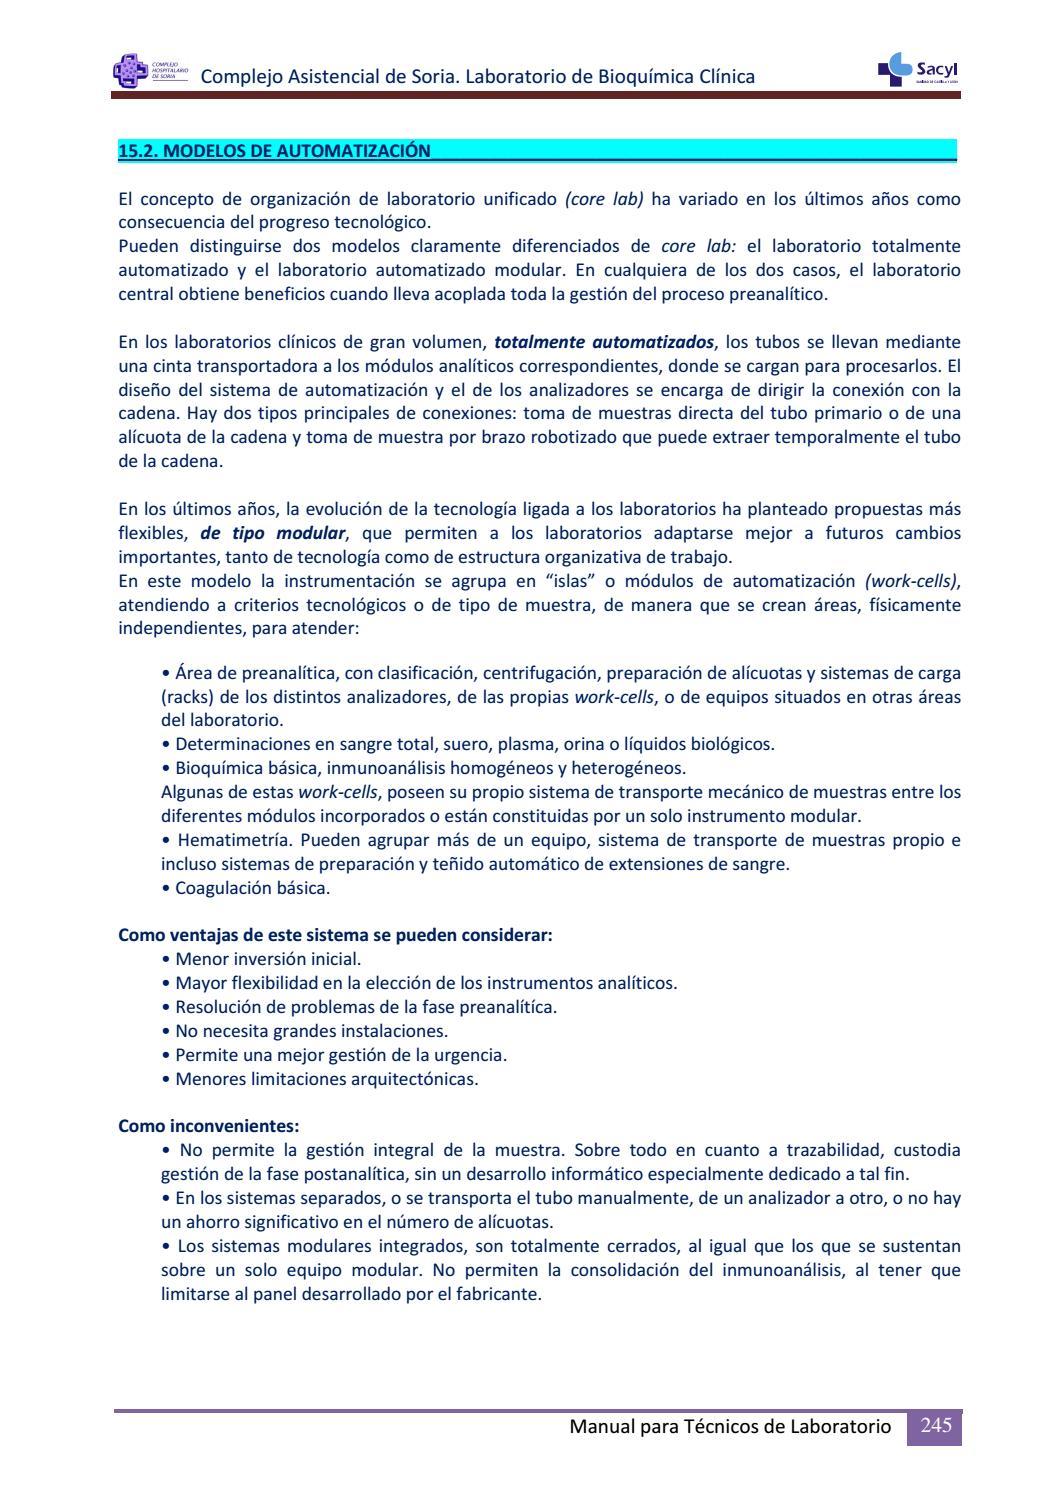 Manual Técnicos Laboratorio By Glpalo Issuu